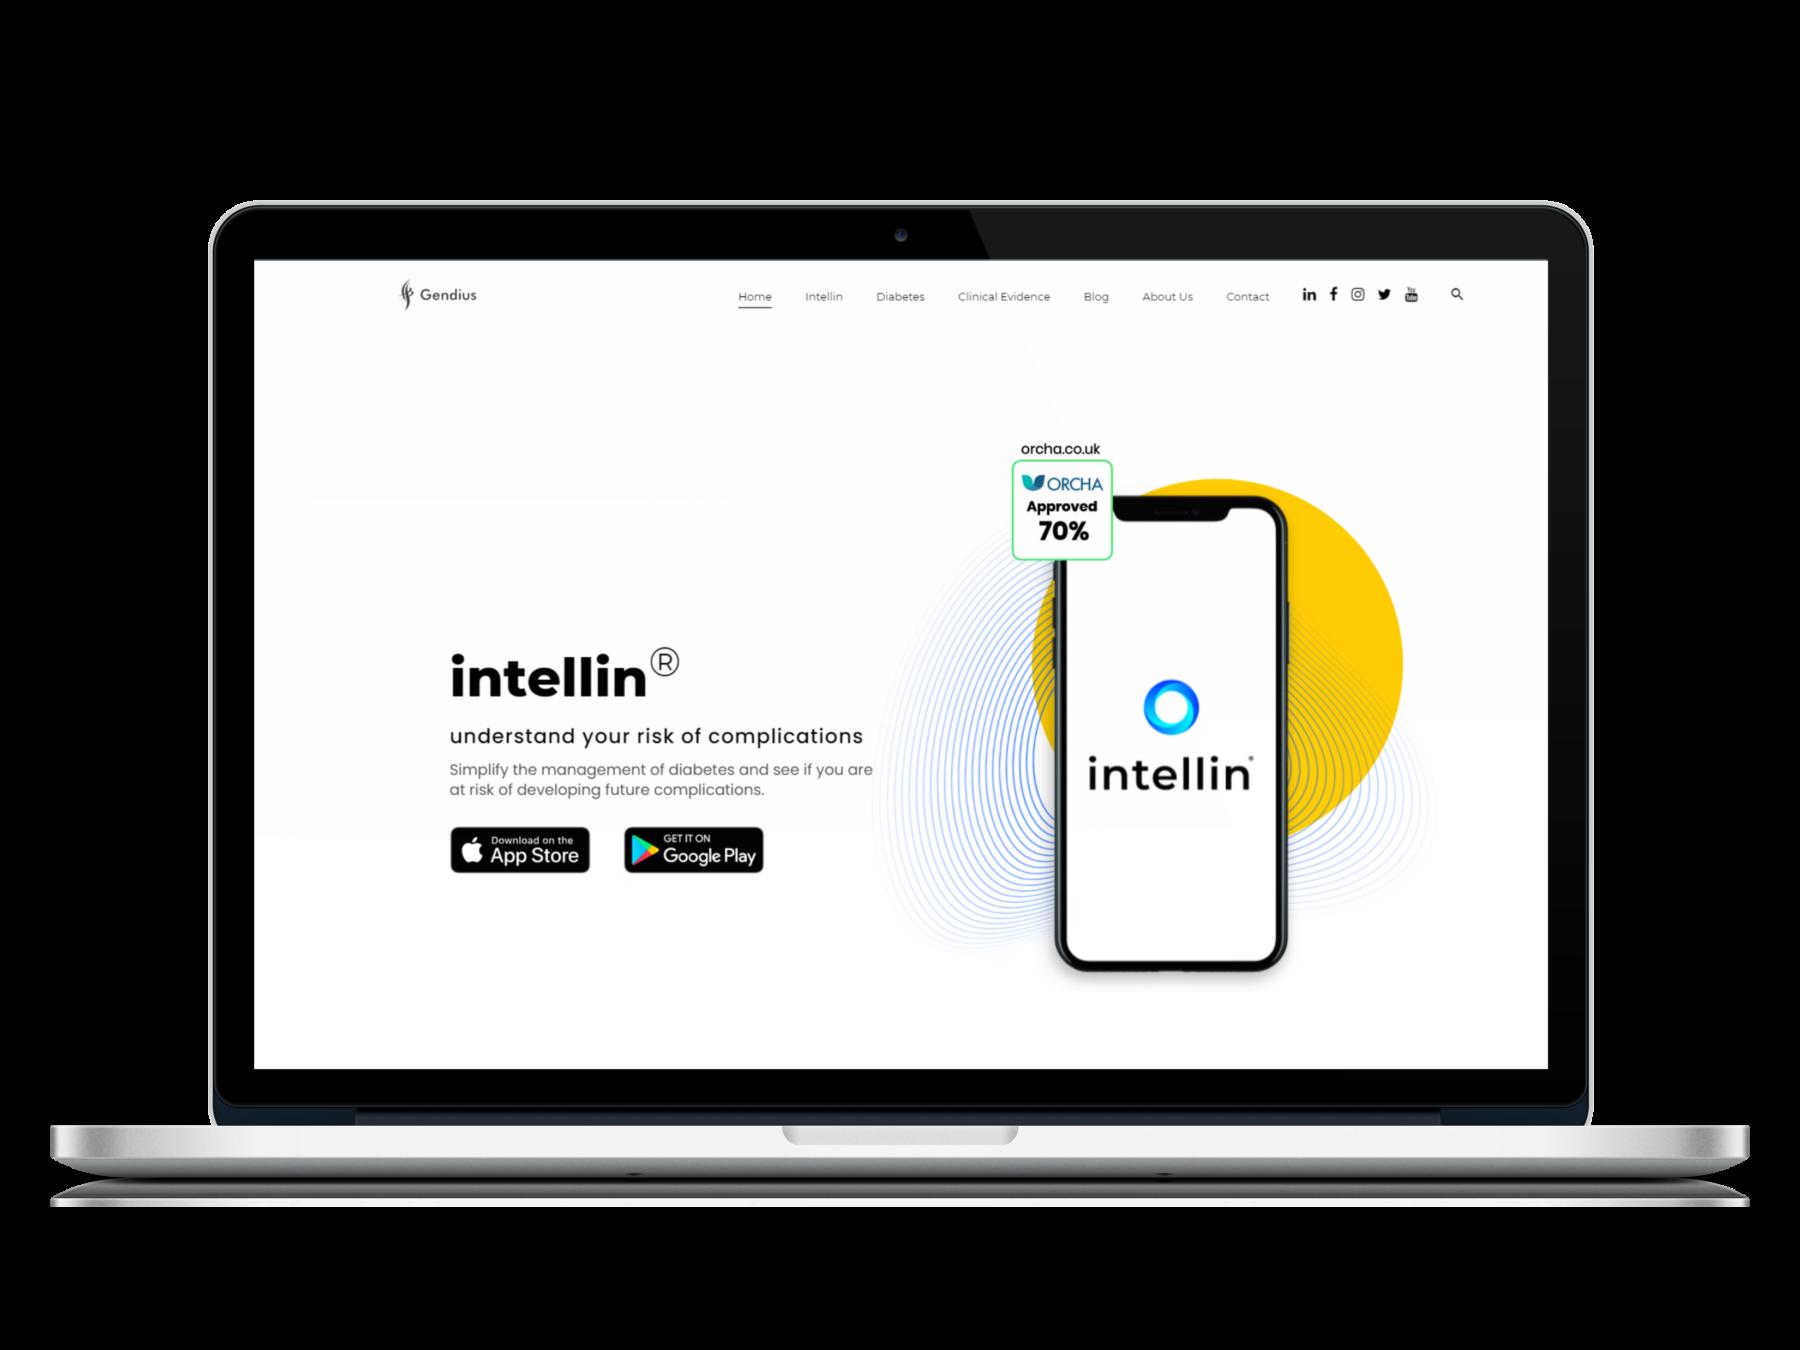 Gendius - Intellin Diabetes Management app | Desktop